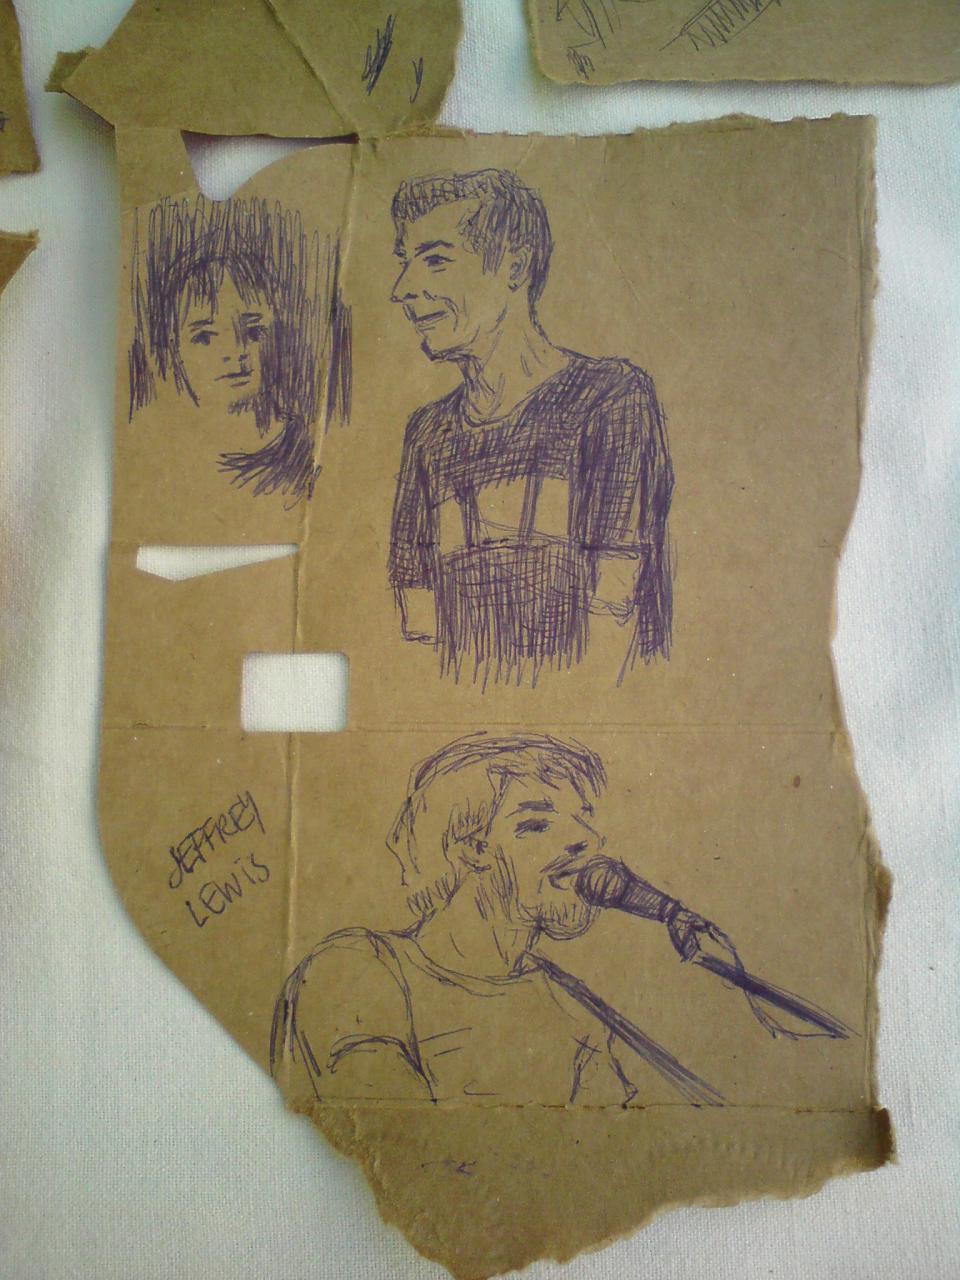 Concert sketches